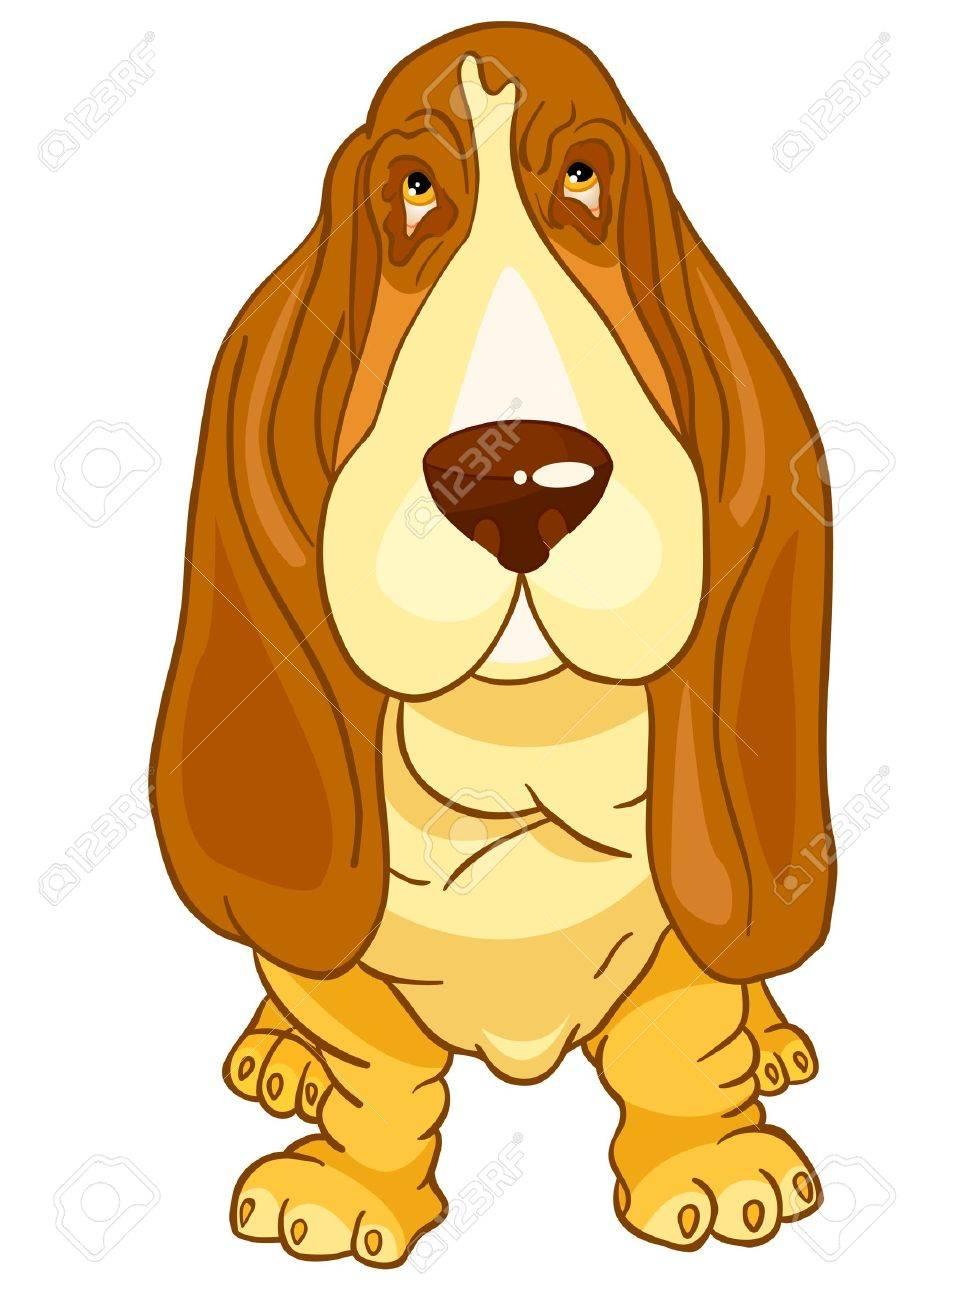 Cartoon Character Dog Stock Vector - 11160145